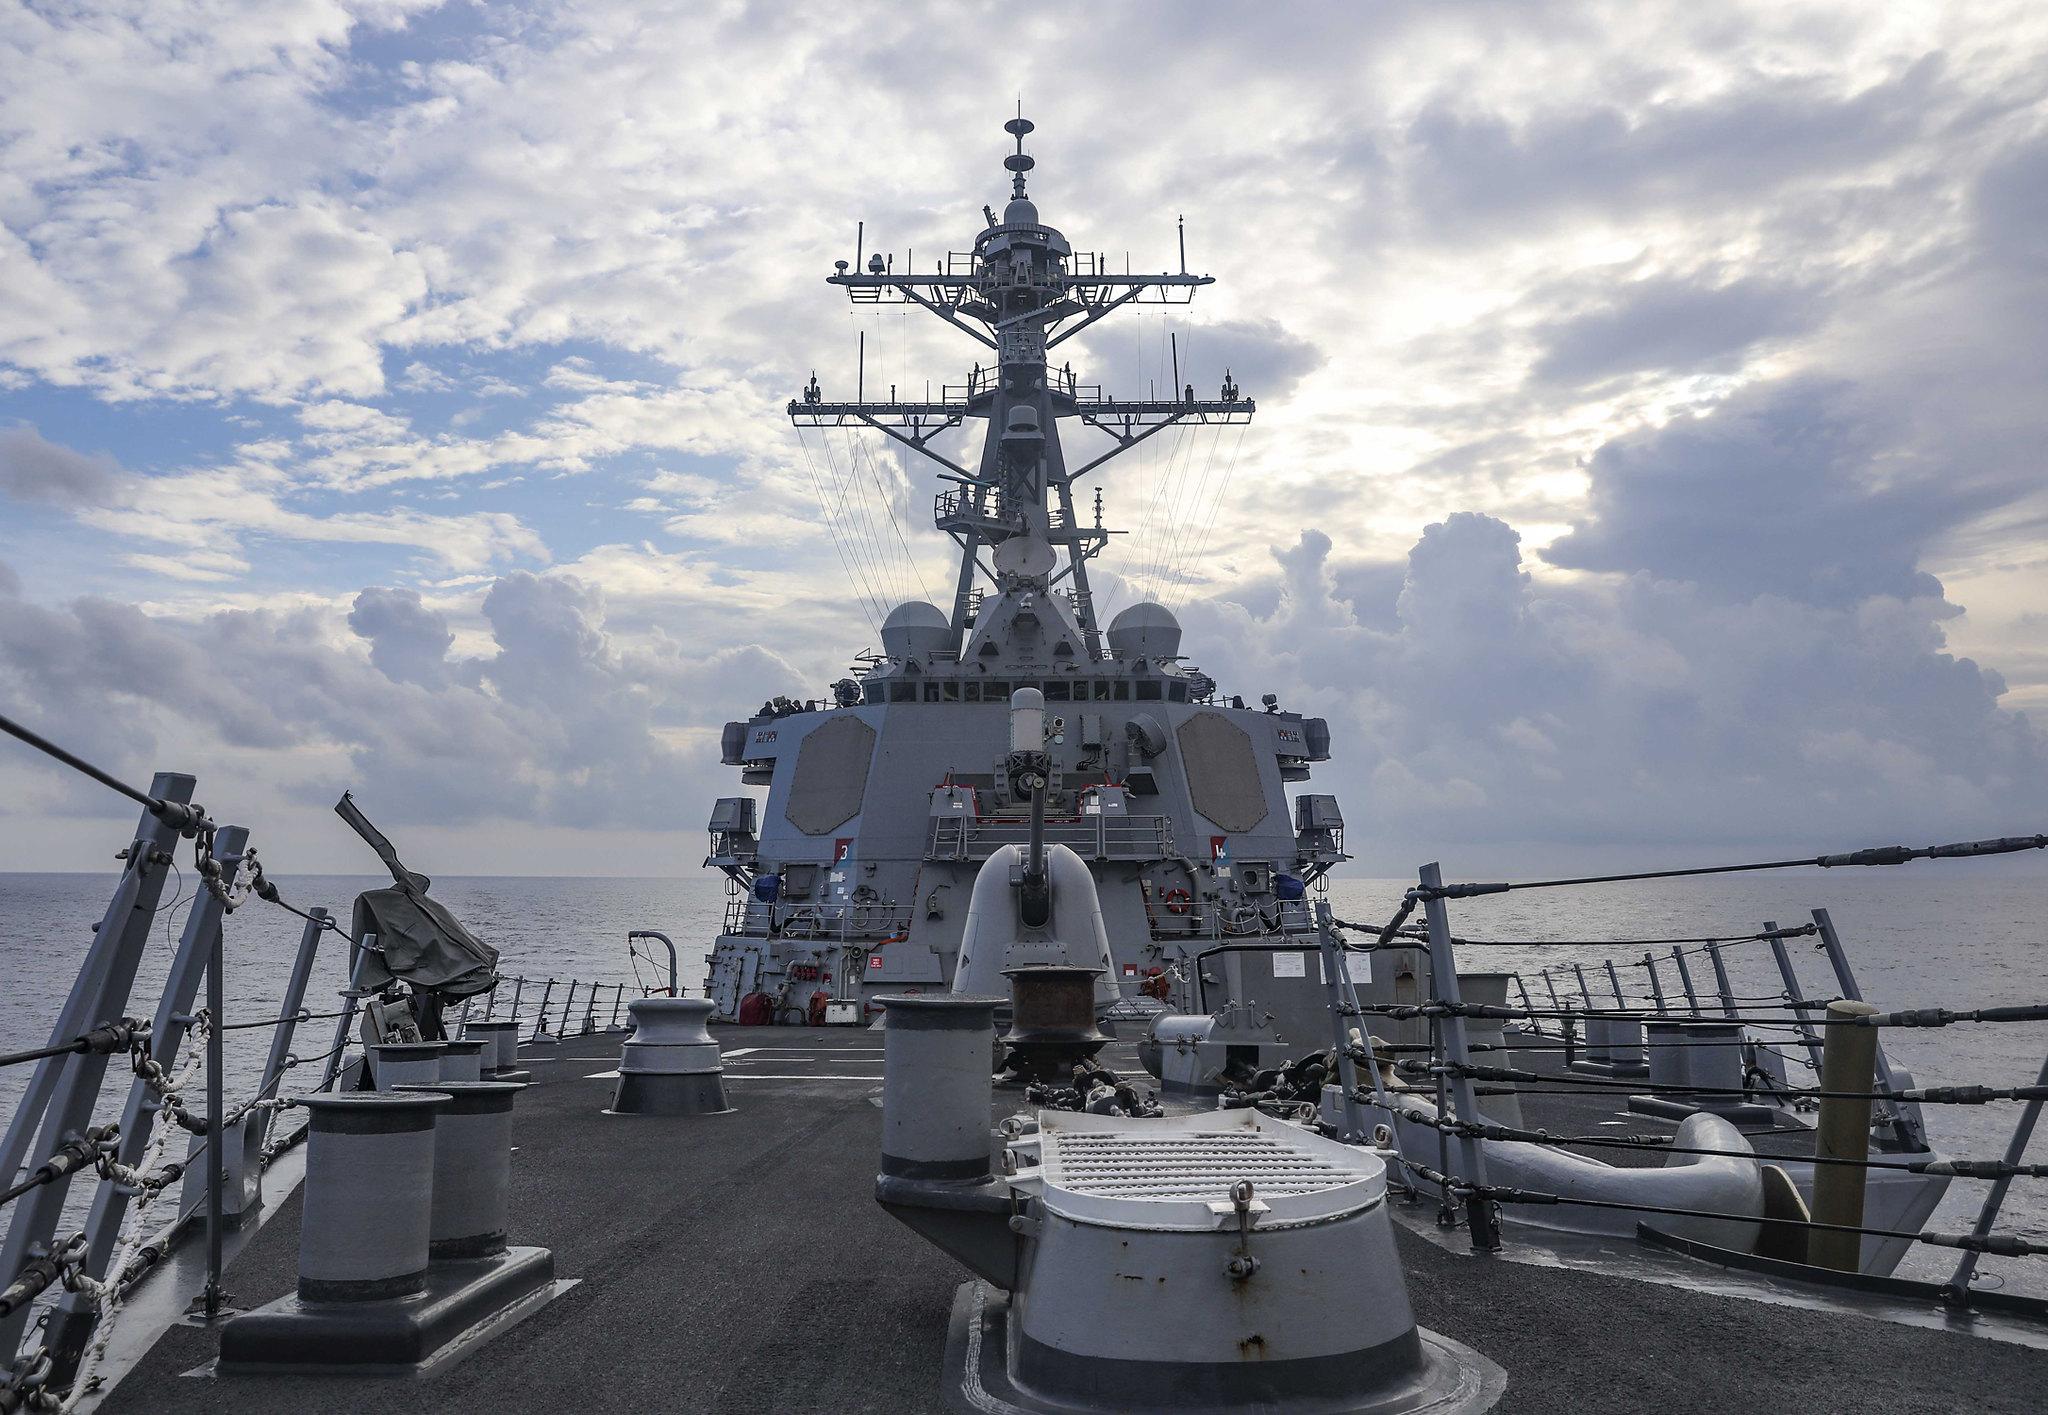 www.cpf.navy.mil